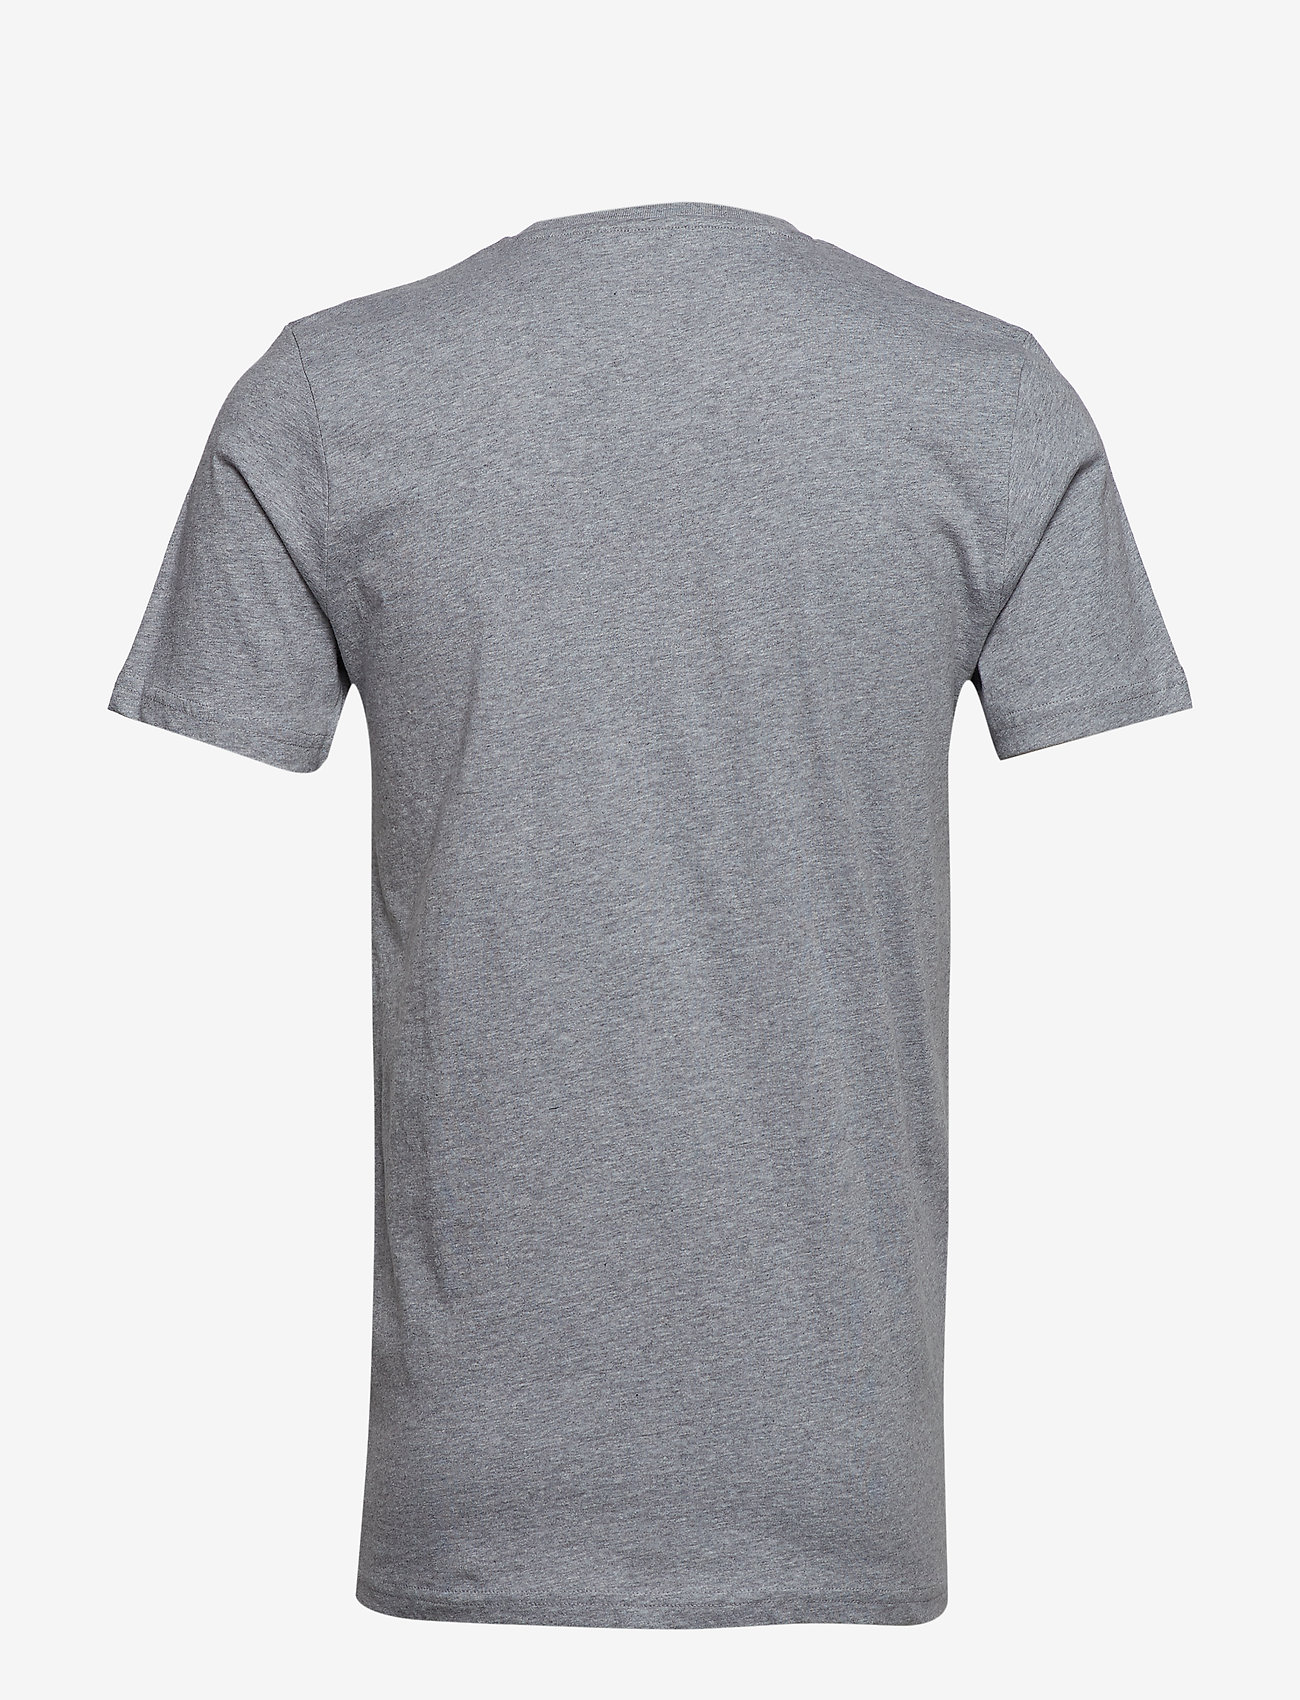 Knowledge Cotton Apparel ALDER owl chest tee - GOTS/Vegan - T-skjorter GREY MELANGE - Menn Klær